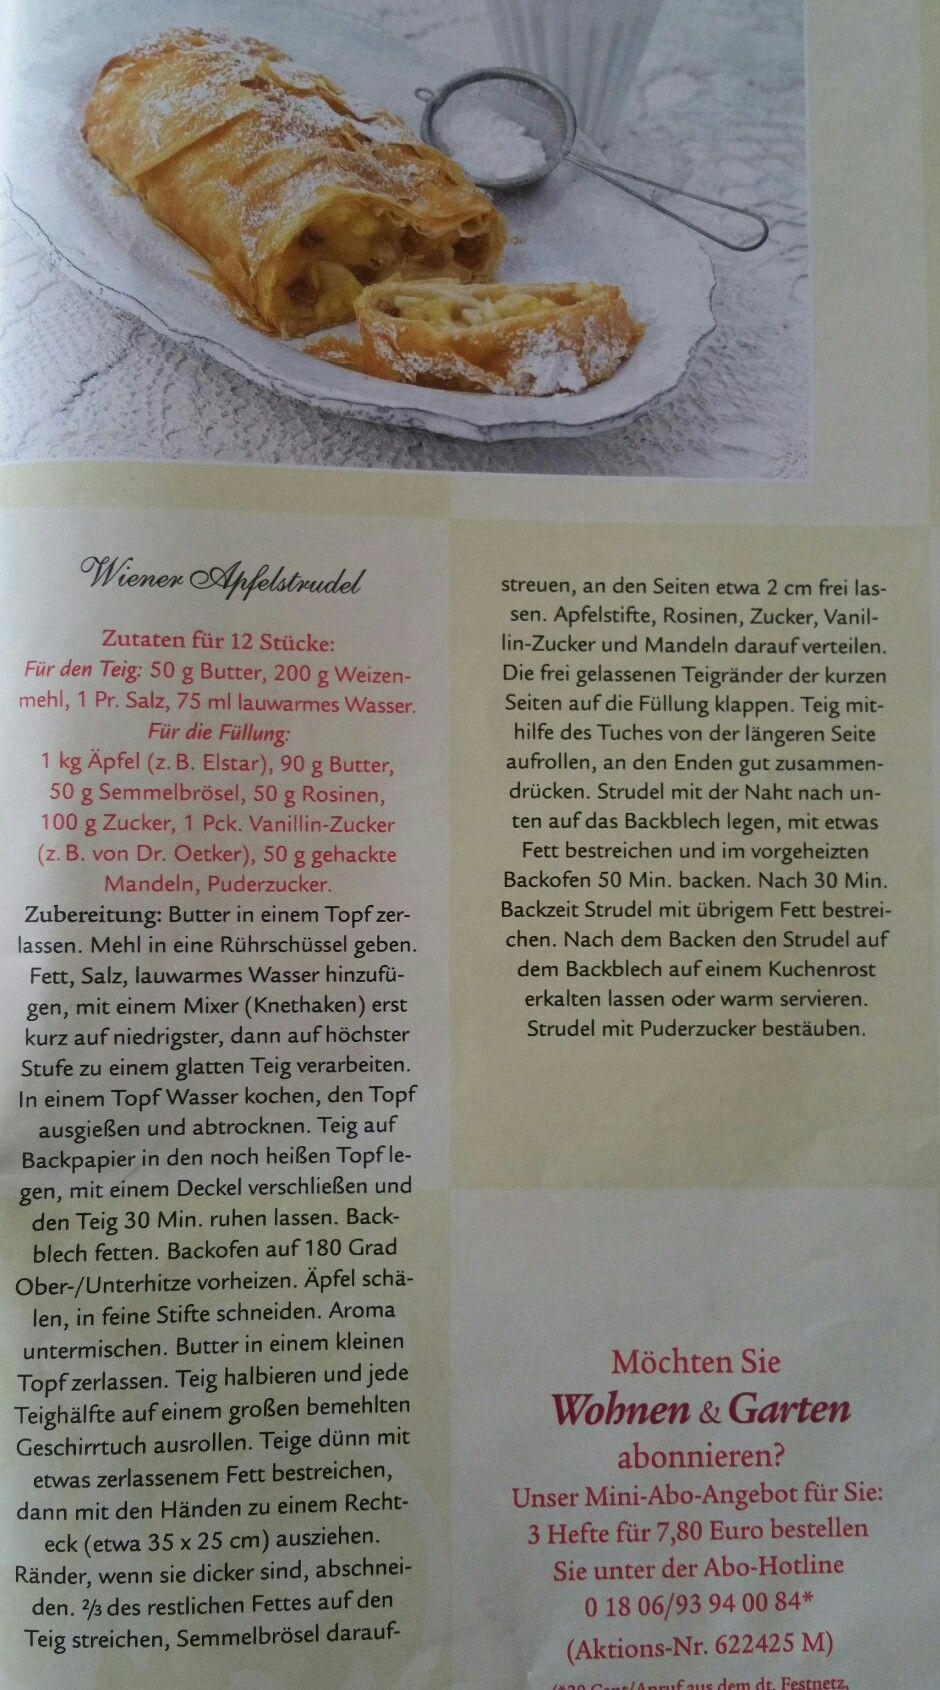 Full Size of Wohnen Und Garten Abo Wiener Apfelstrudel Whirlpool Stapelstühle Landschaftsbau Berlin Villeroy Boch Bad Trampolin Spielgerät Sitzgruppe Spielhaus Runde Garten Wohnen Und Garten Abo